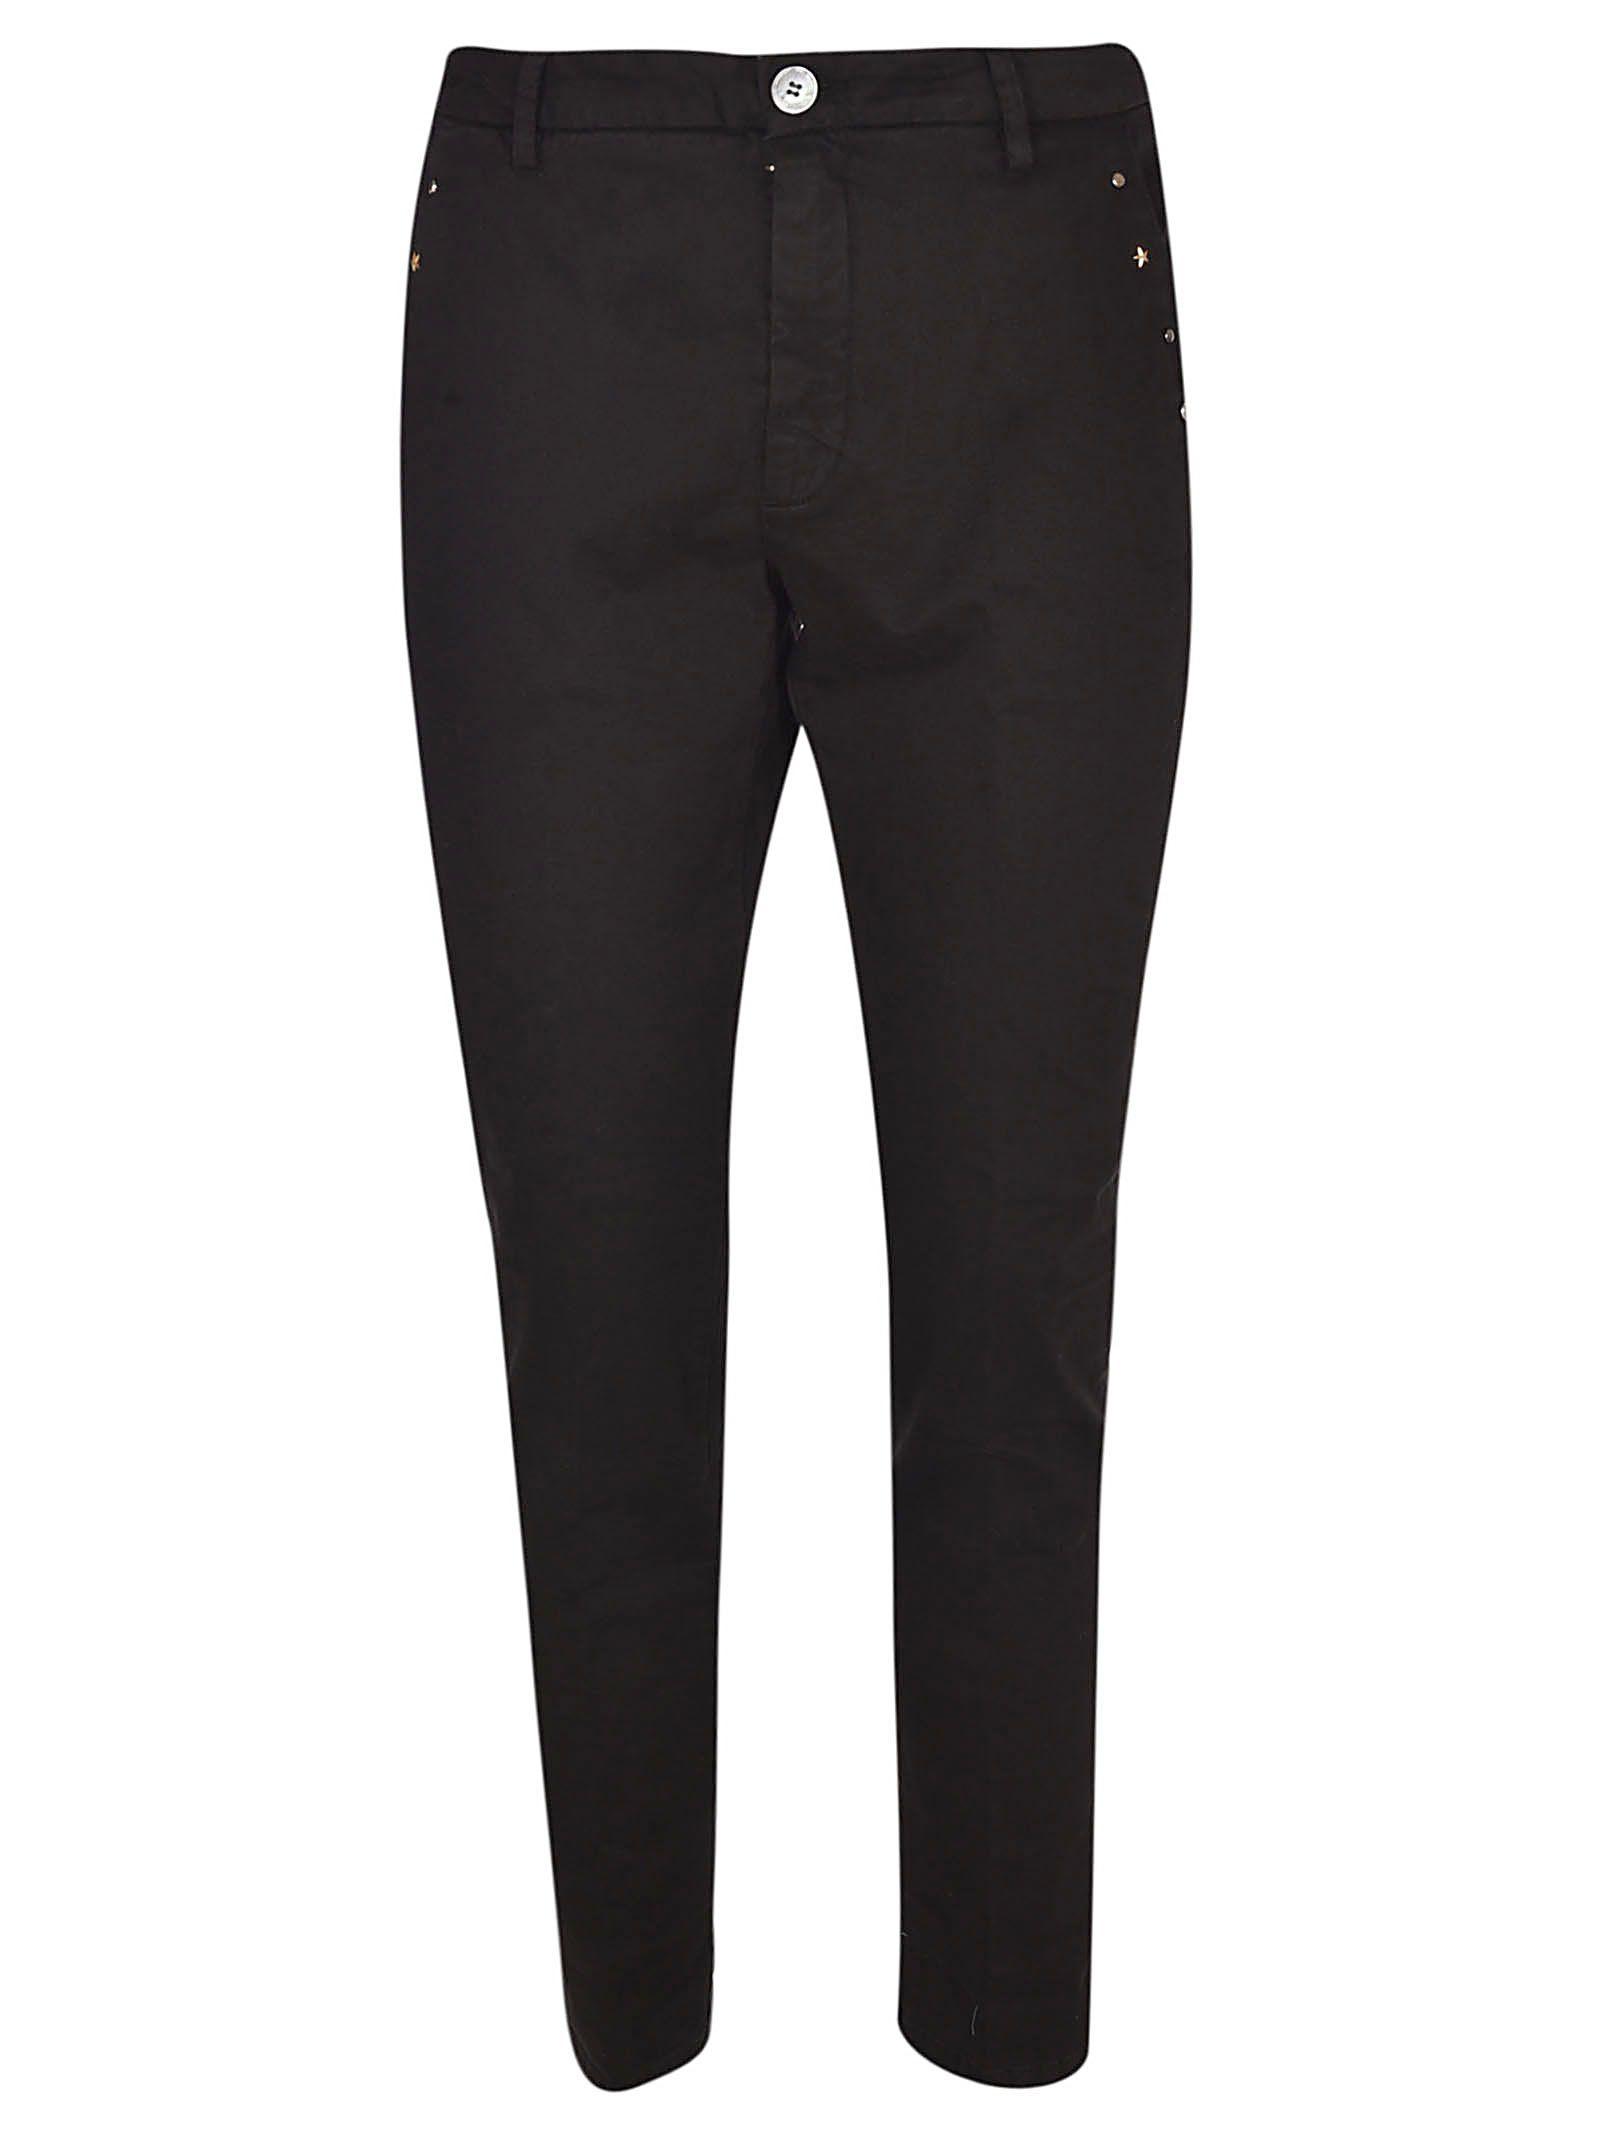 AGLINI Studded Trousers in Dir 11Gw